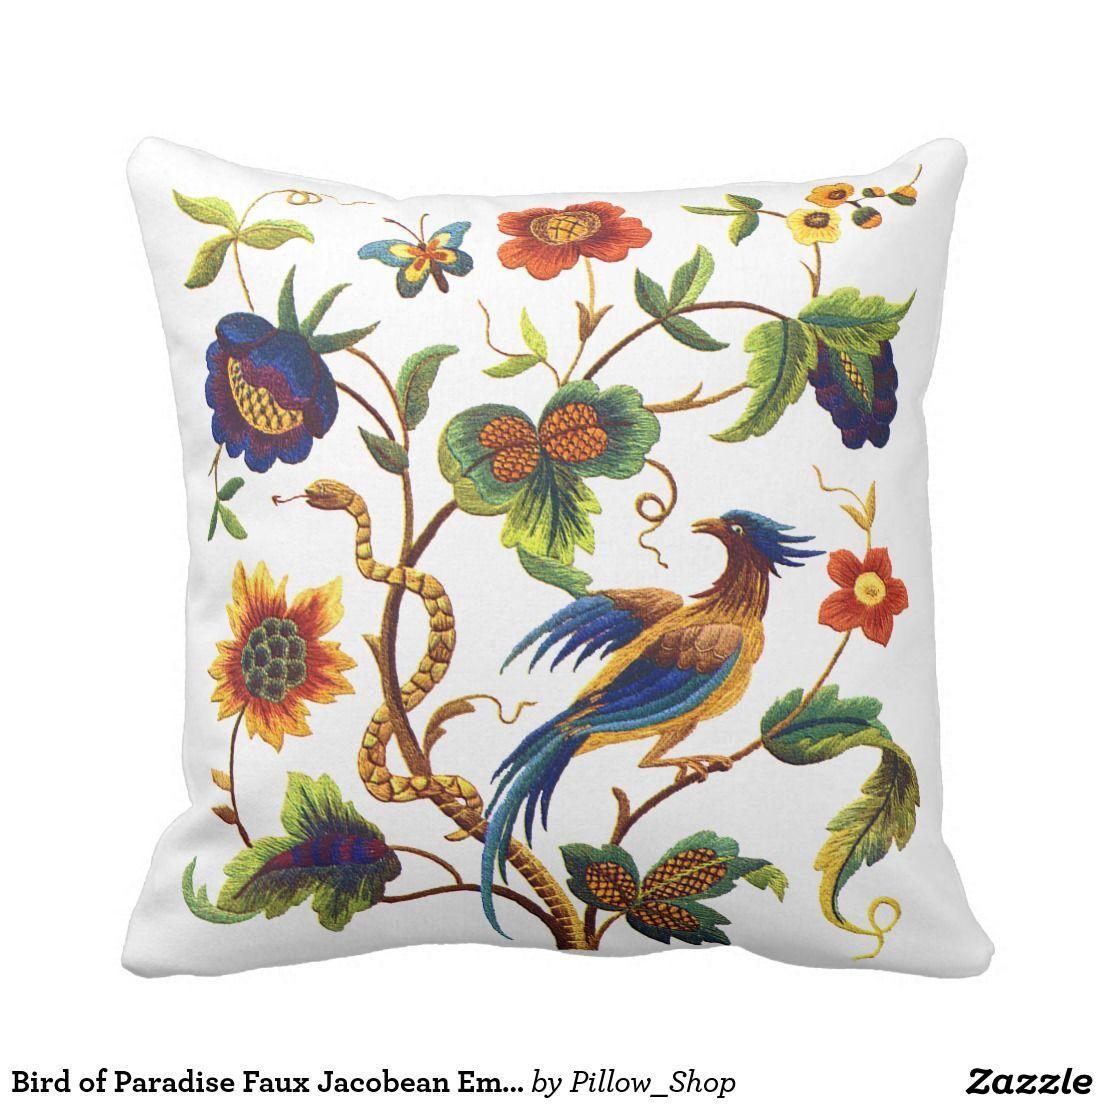 Bird of Paradise Faux Jacobean Embroidery Throw Pillow | Crewel ...